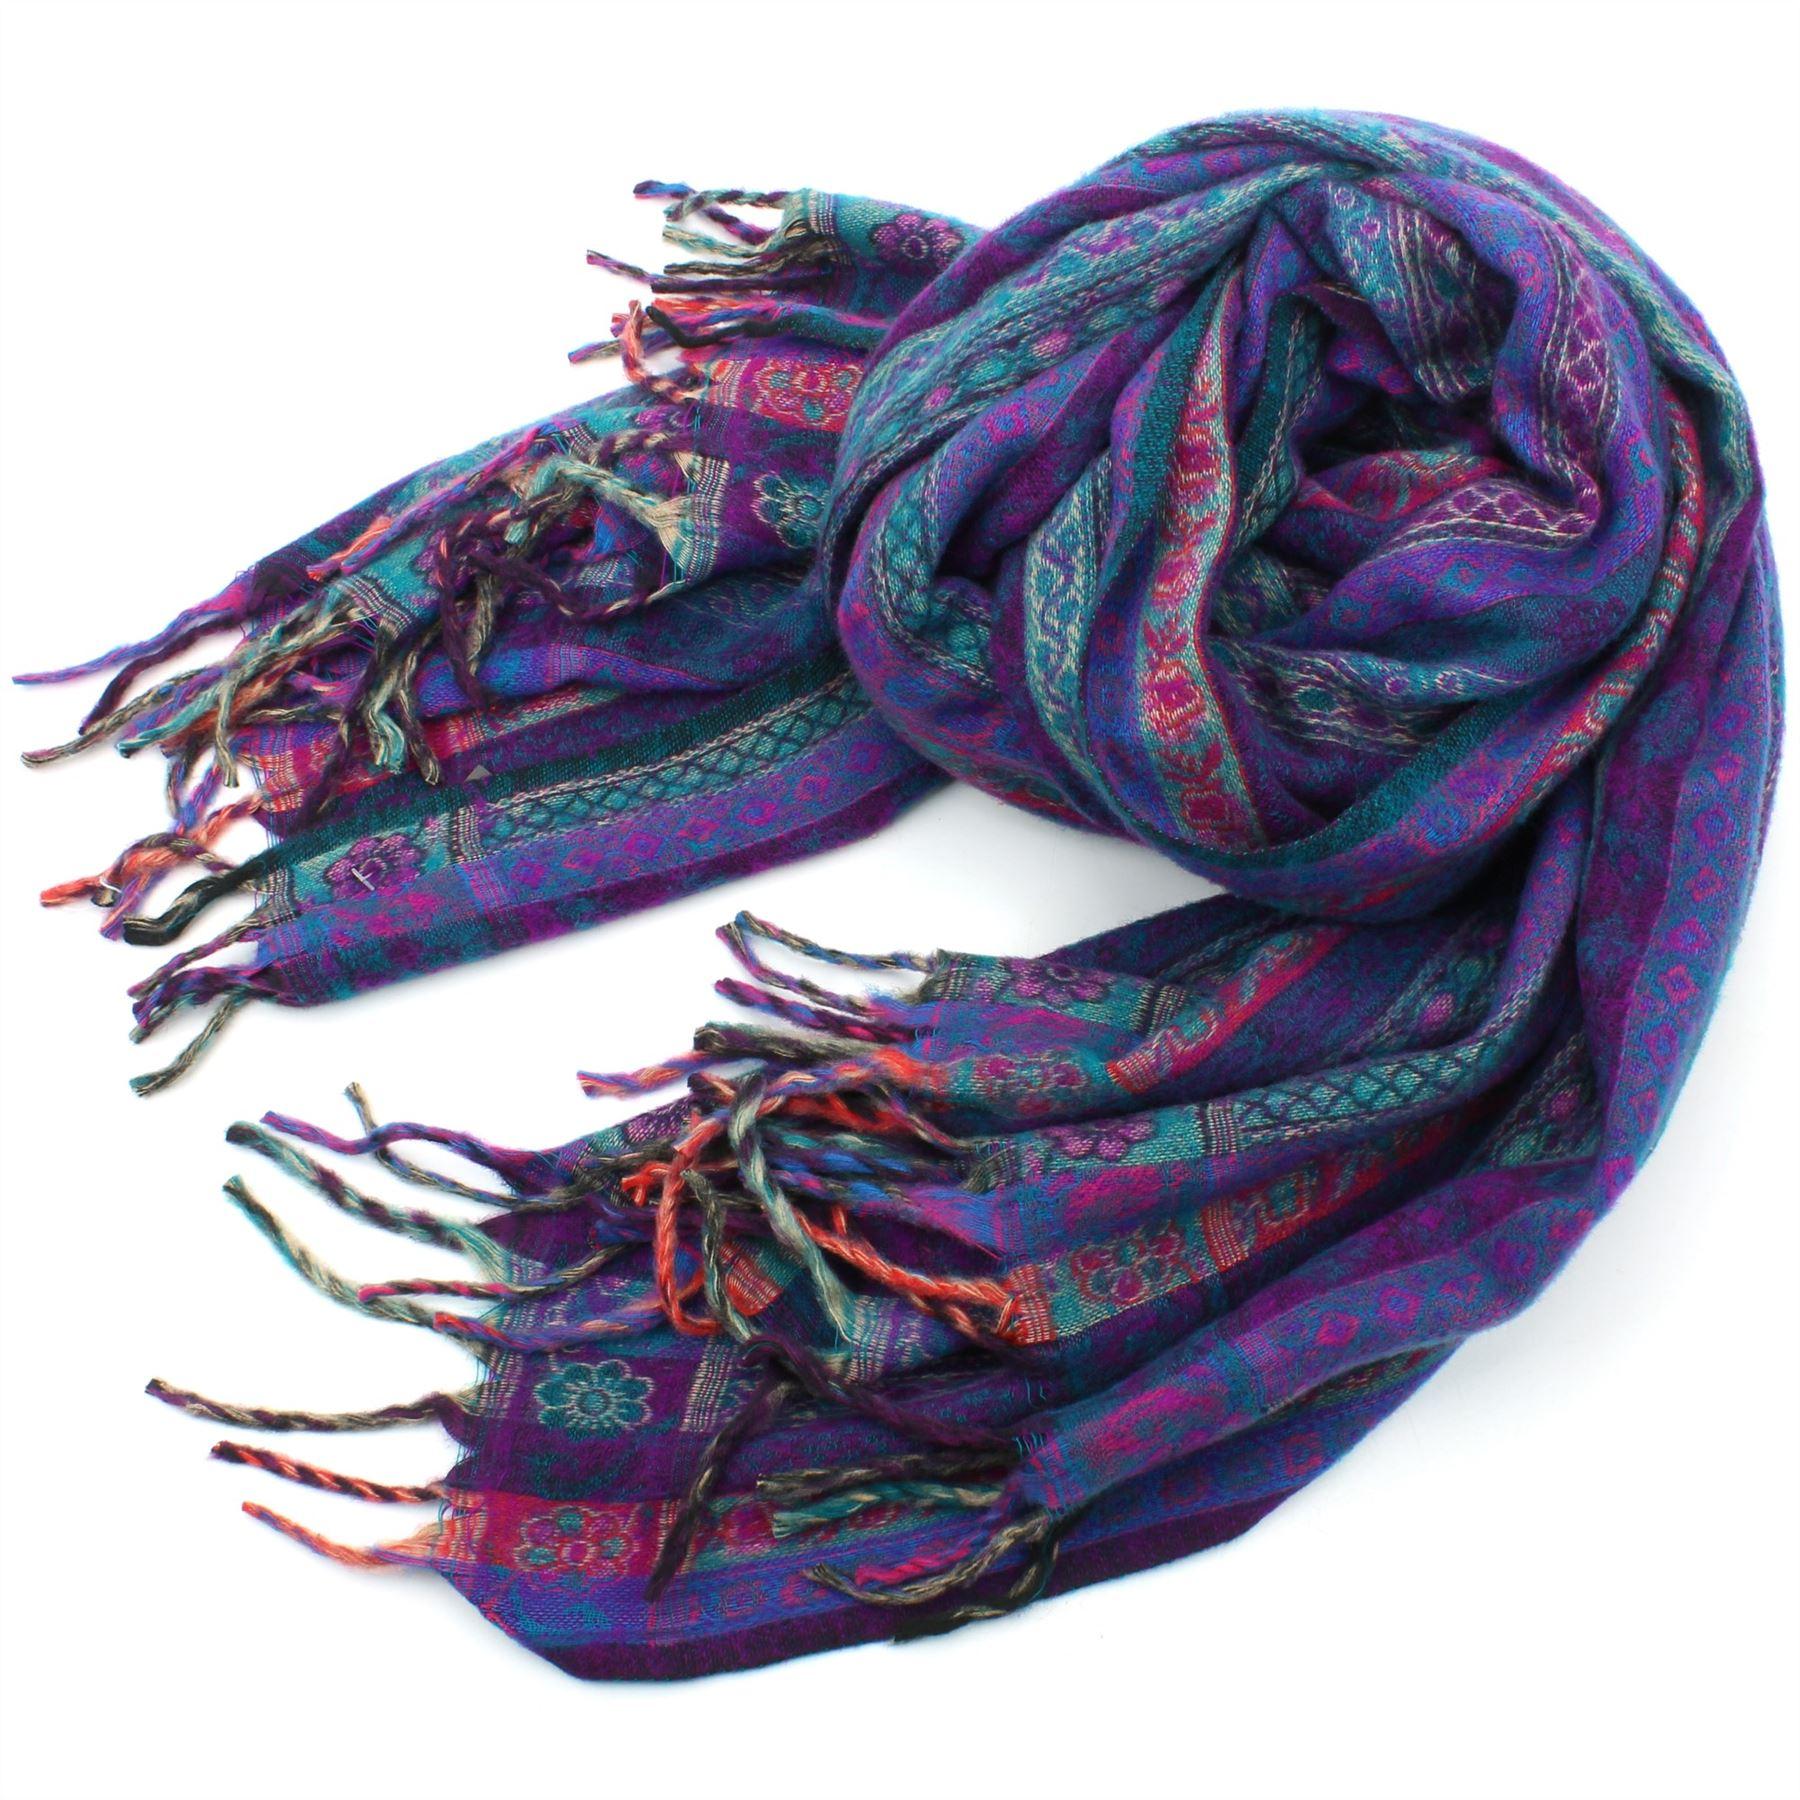 Acrylic-Wool-Blanket-Shawl-Wrap-Throw-Finest-Softest-India-Stripe-Paisley-Travel thumbnail 25